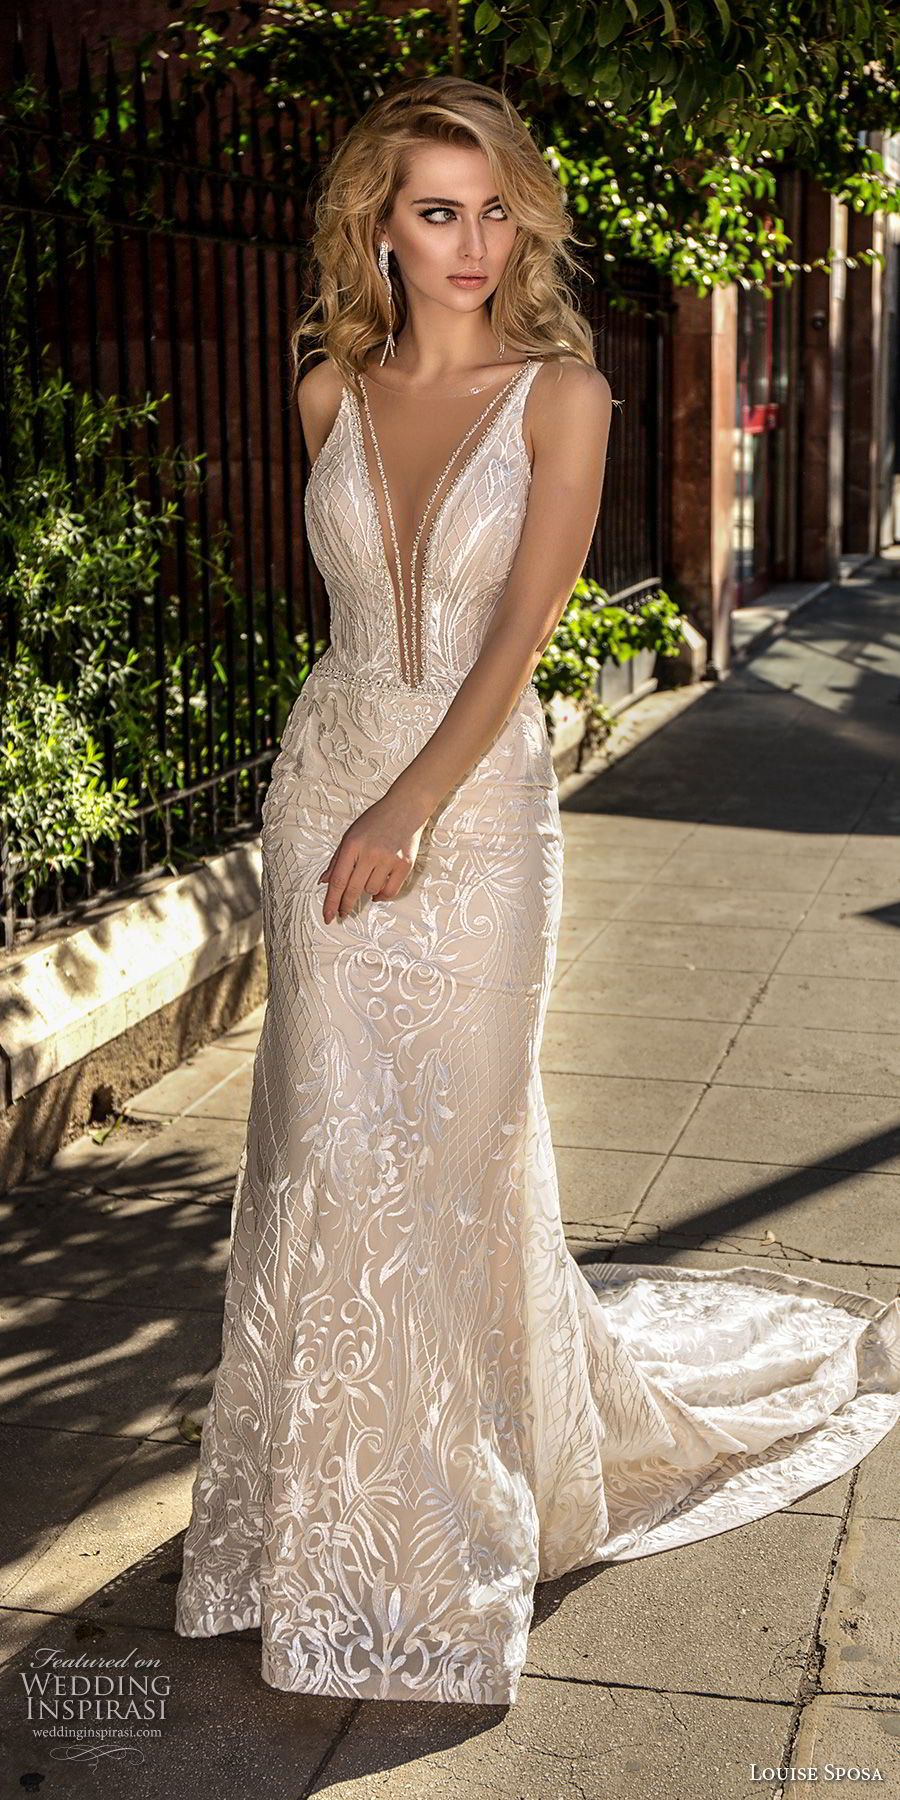 Louise sposa wedding dresses wedding trends pinterest